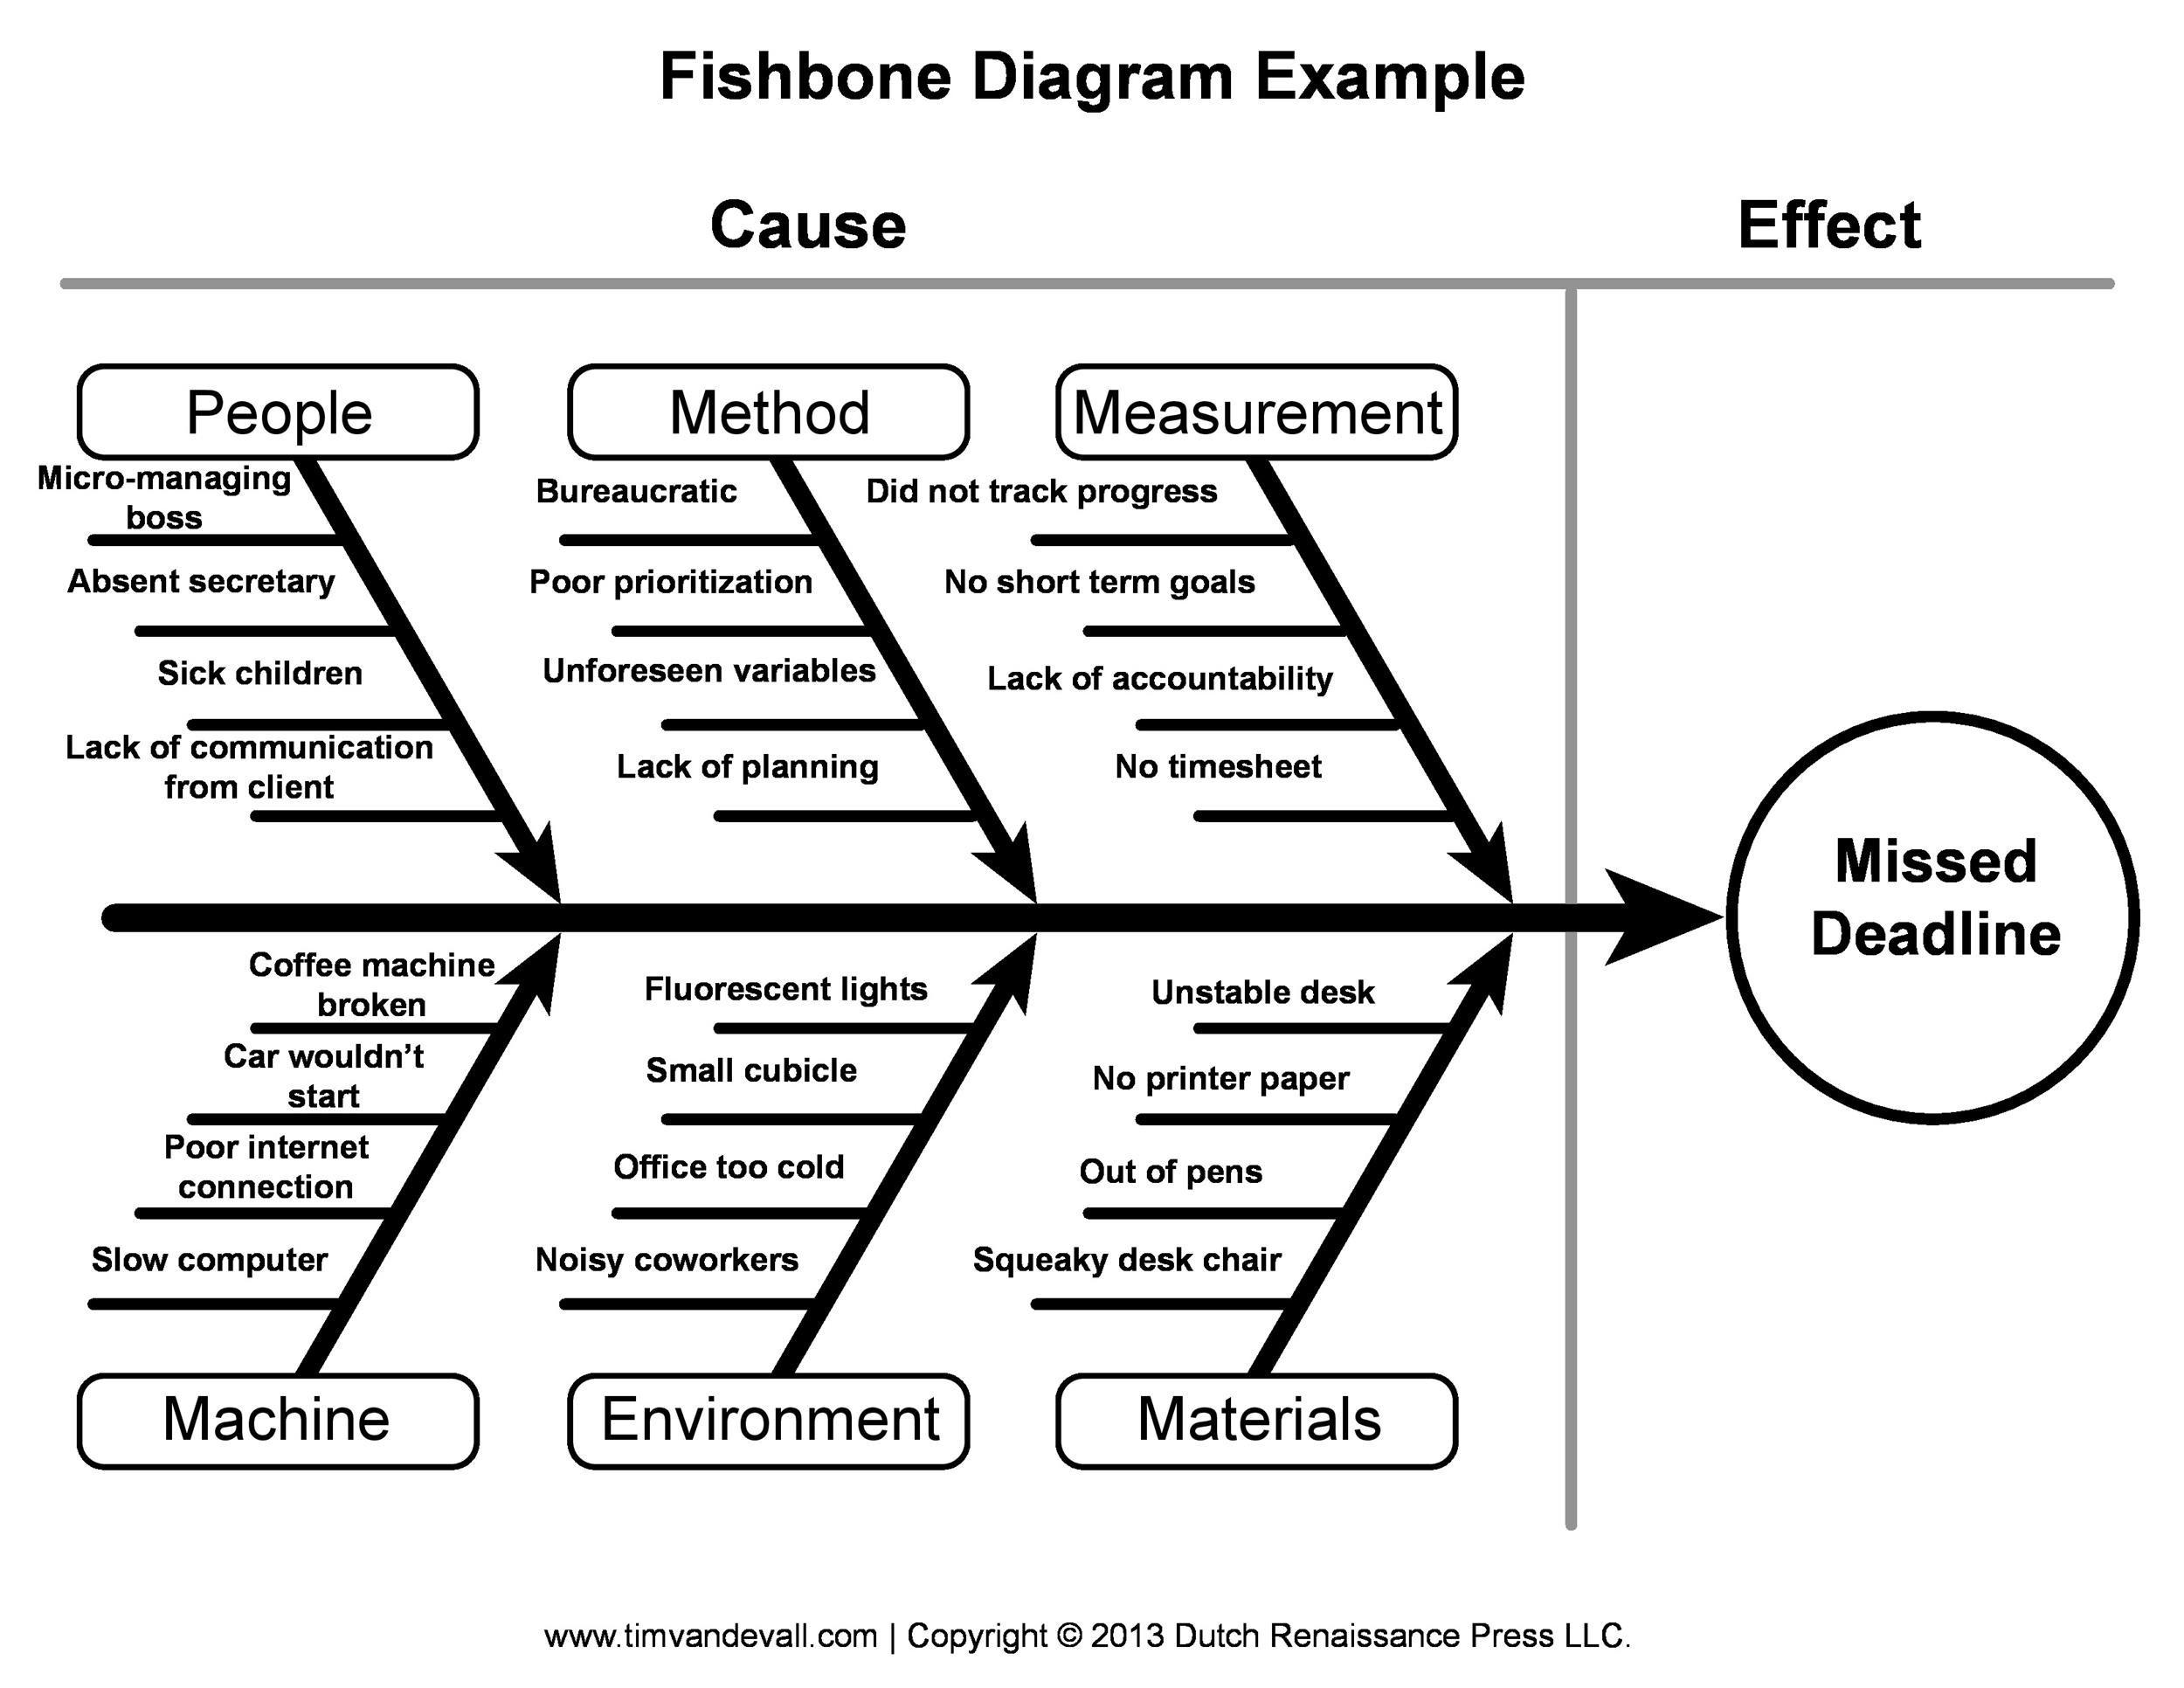 Lab Fishbone Diagrams